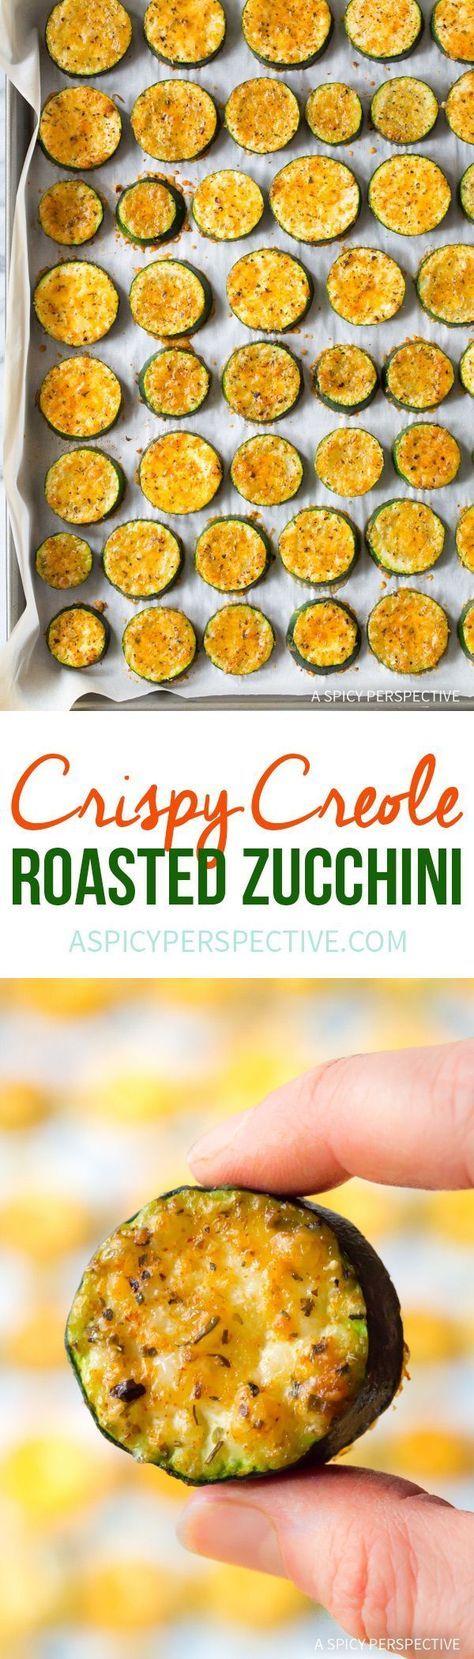 Crispy Creole Roasted Zucchini Recipe  #lowcarb  via @spicyperspectiv